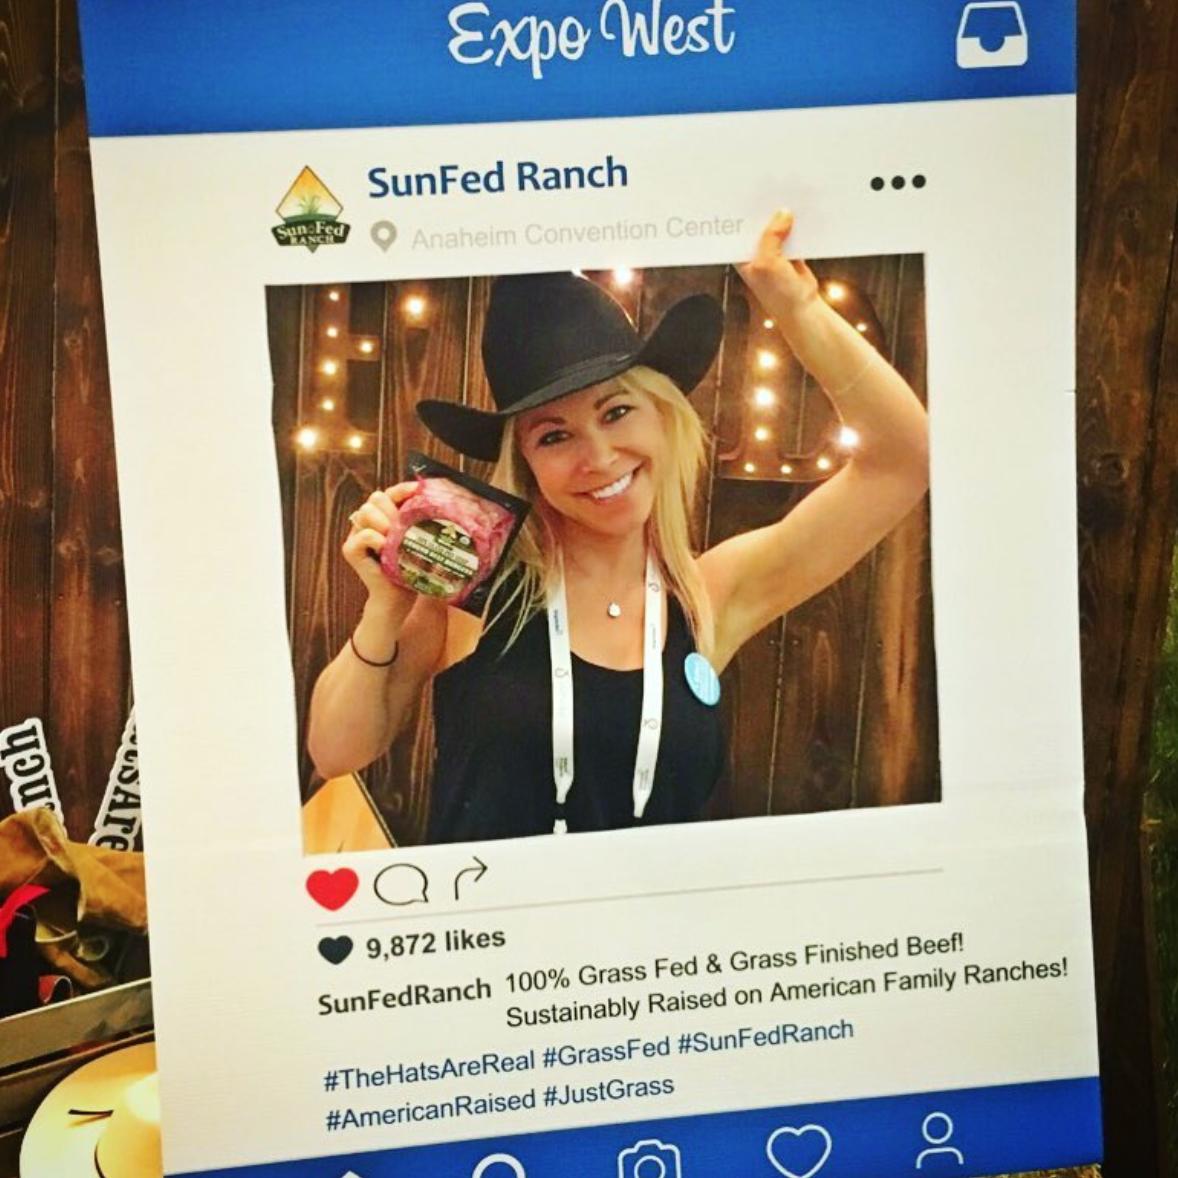 sunfed ranch gigi eats celebrities